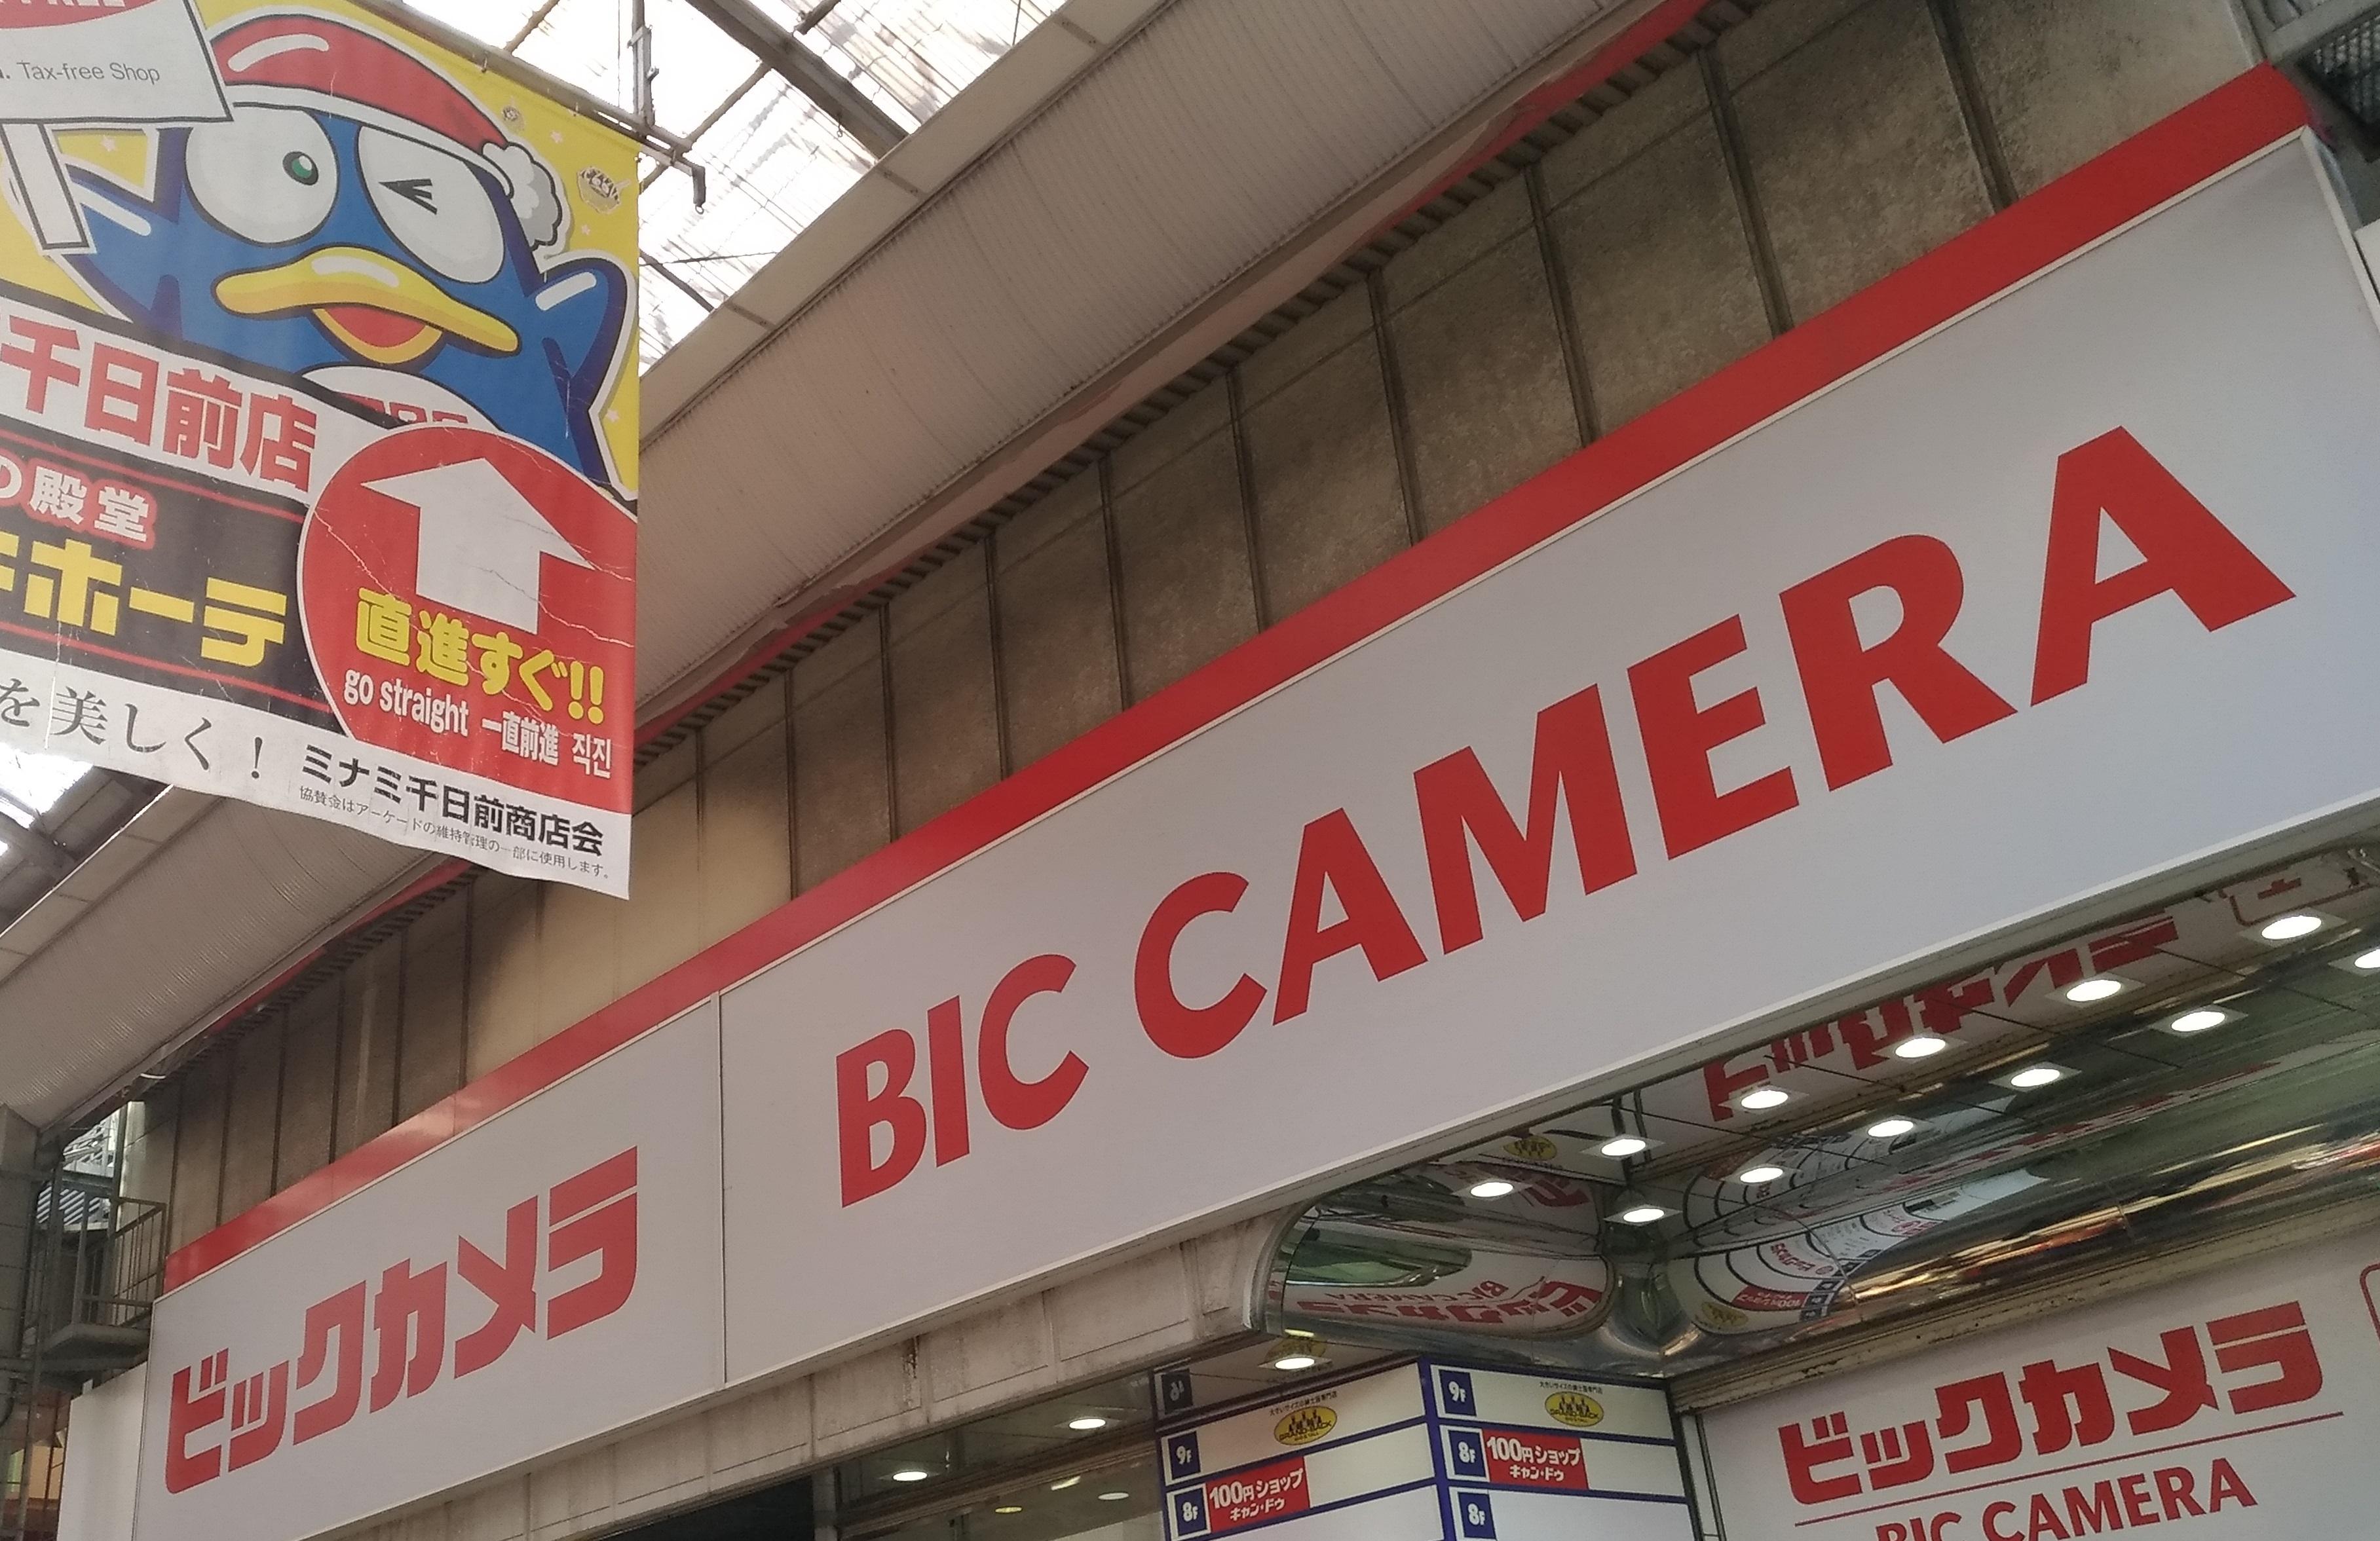 osaka_namba_bic_camera.jpg